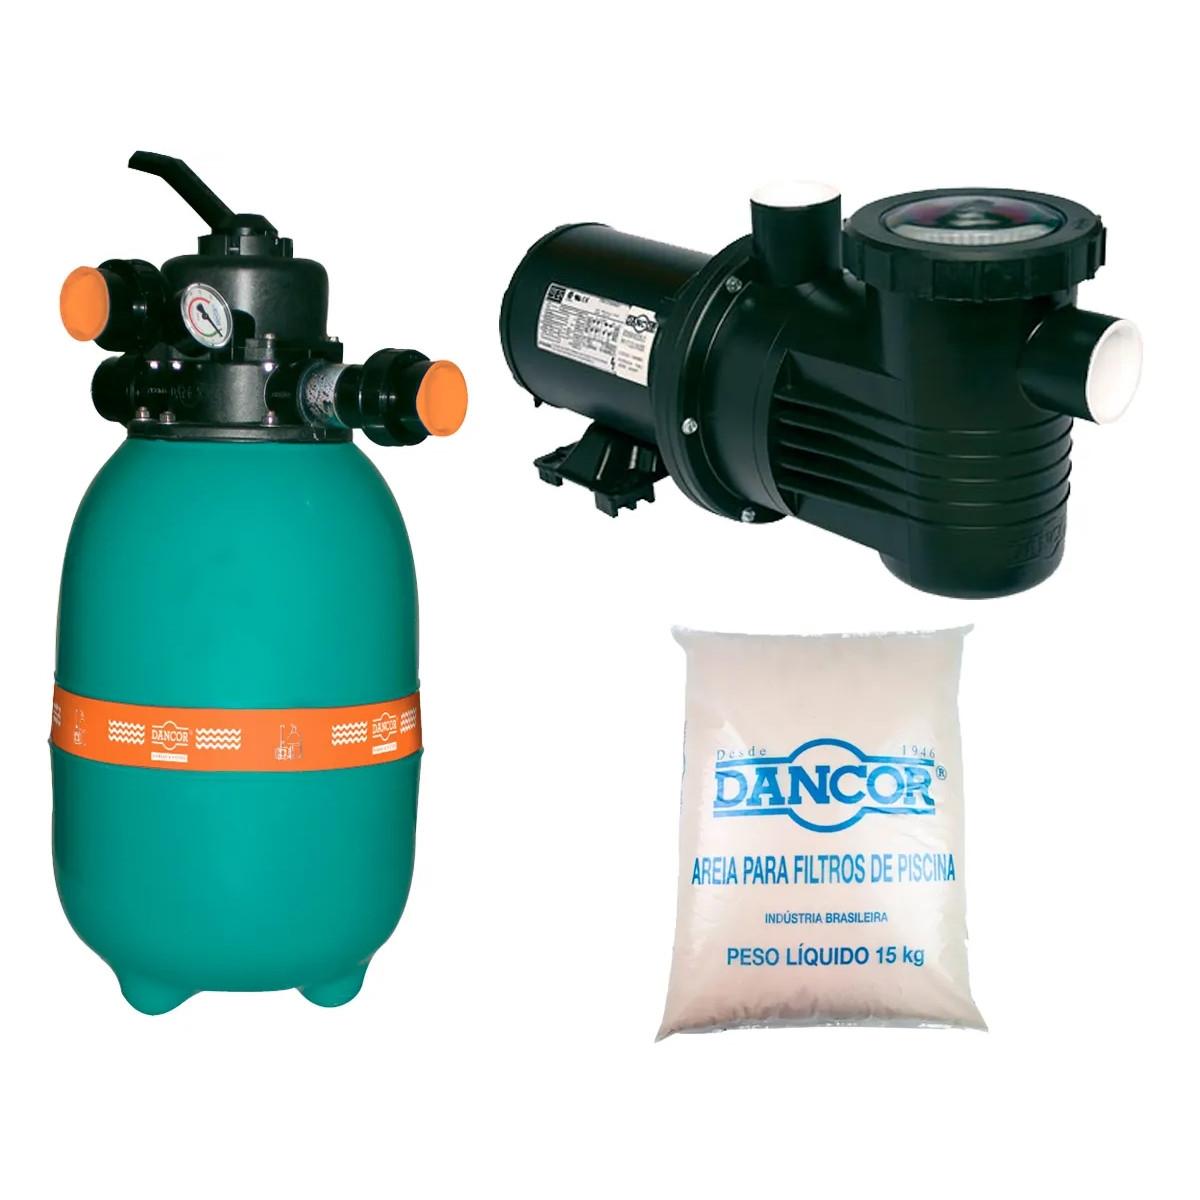 Filtro para Piscina com Bomba de 1/4 cv 30 KG AREIA Dancor DFR-12 Piscina até 21.600L